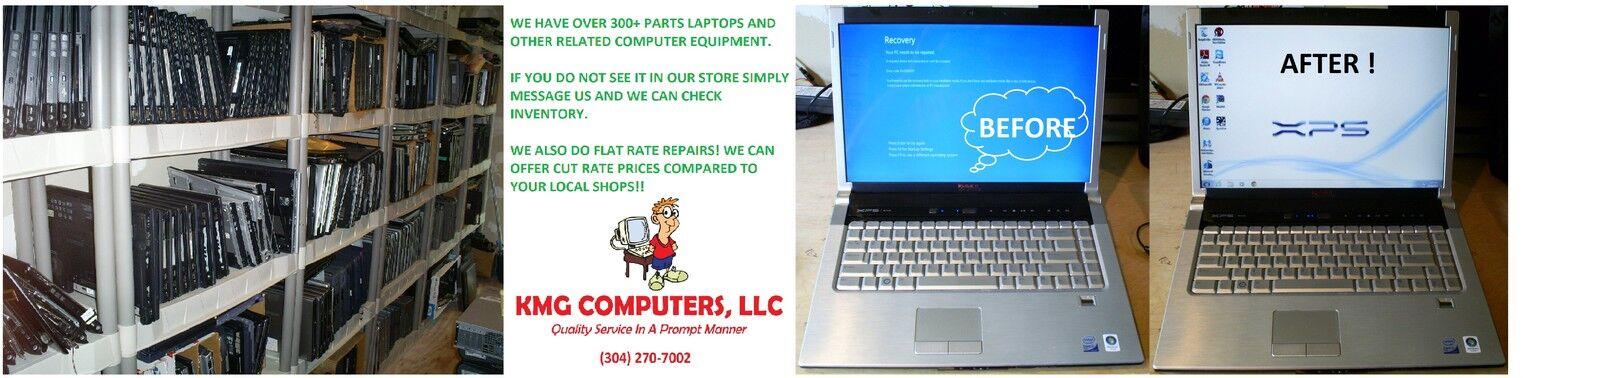 KMG COMPUTERS